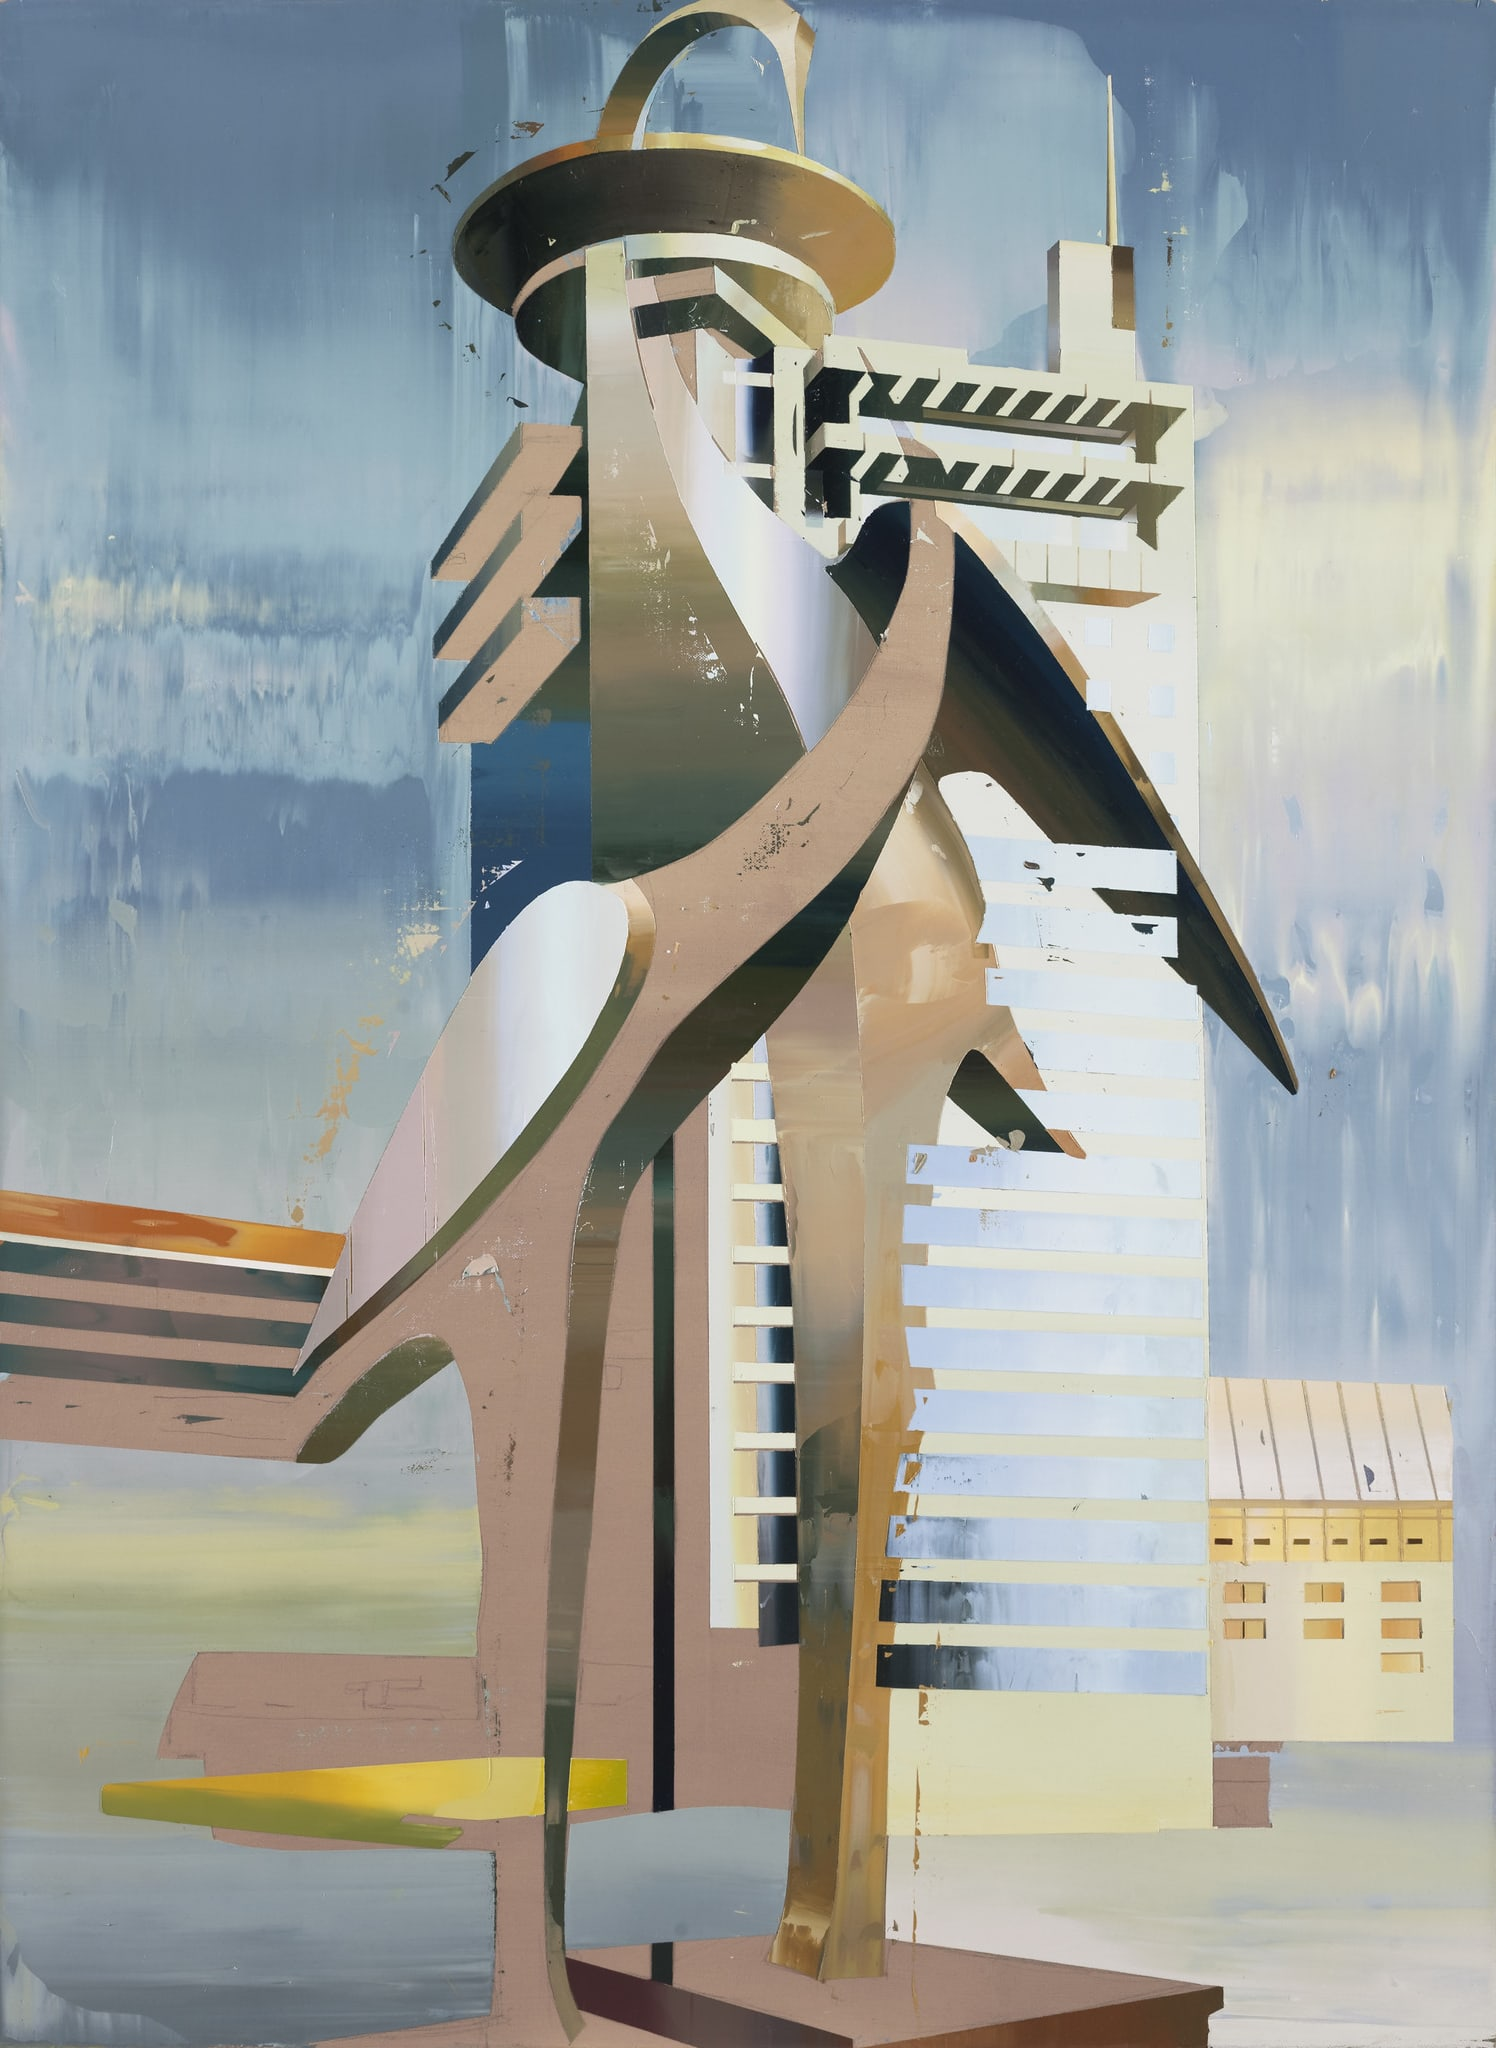 Building of Cranes #1 by Cui Jie